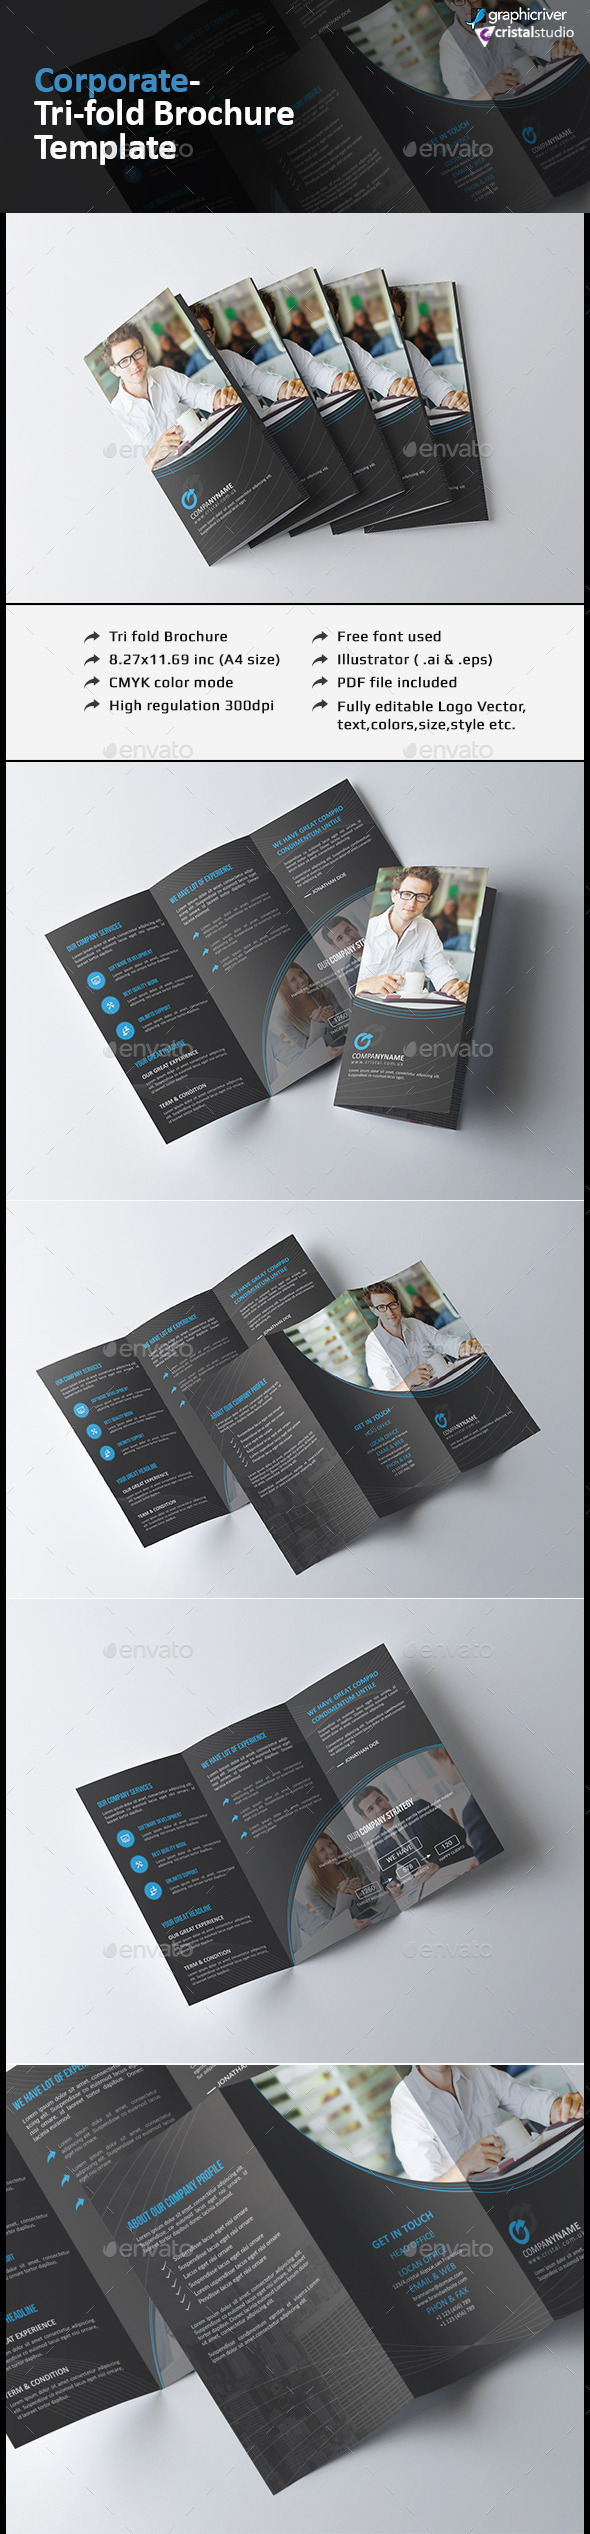 Elegant Tri-fold Brochure - Corporate Brochures